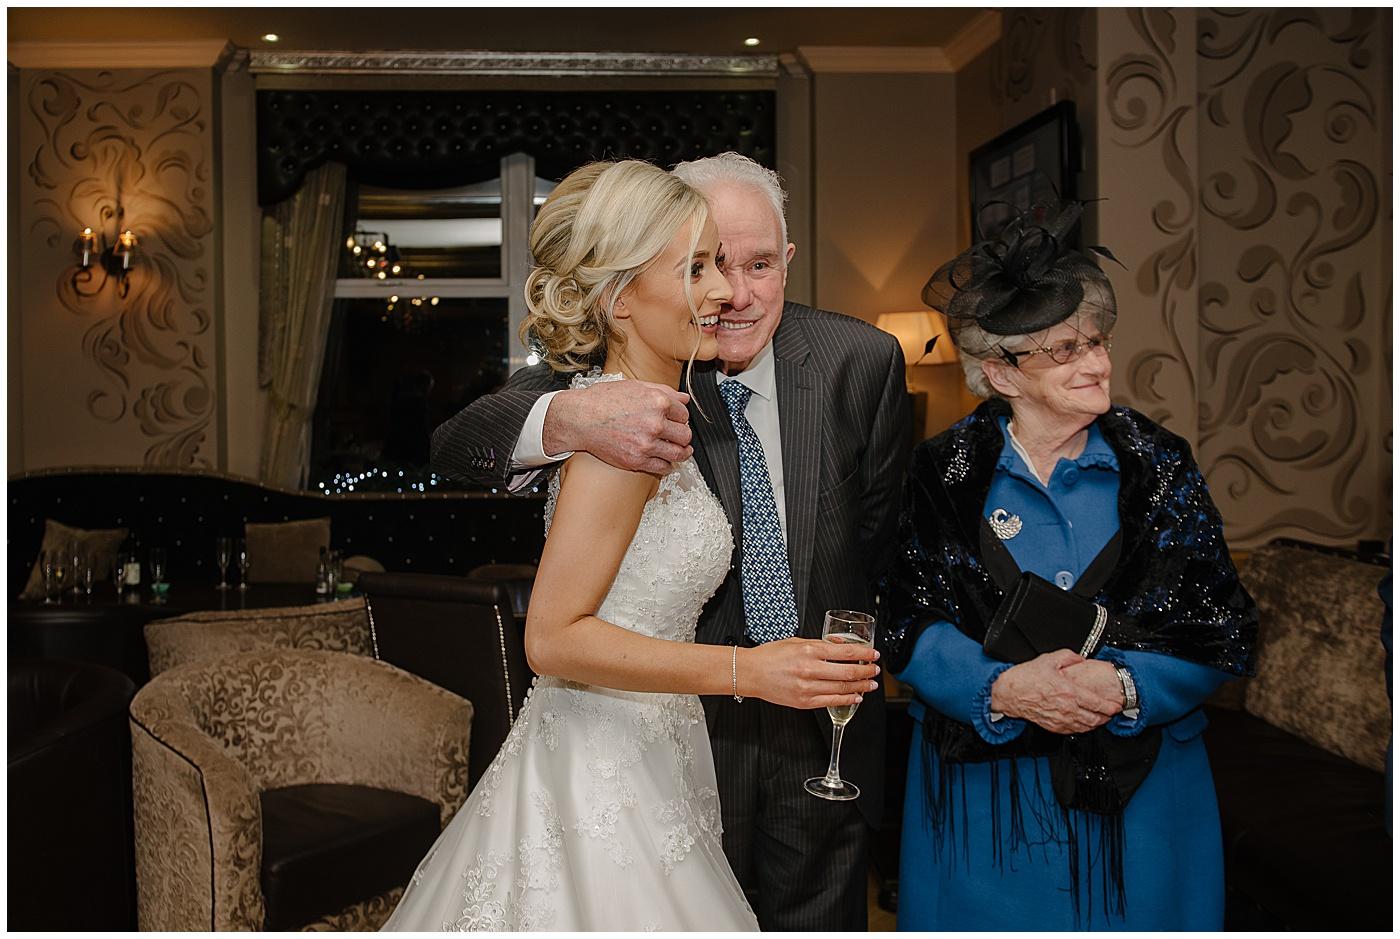 lissan-house-wedding-jude-browne-photography_0104.jpg